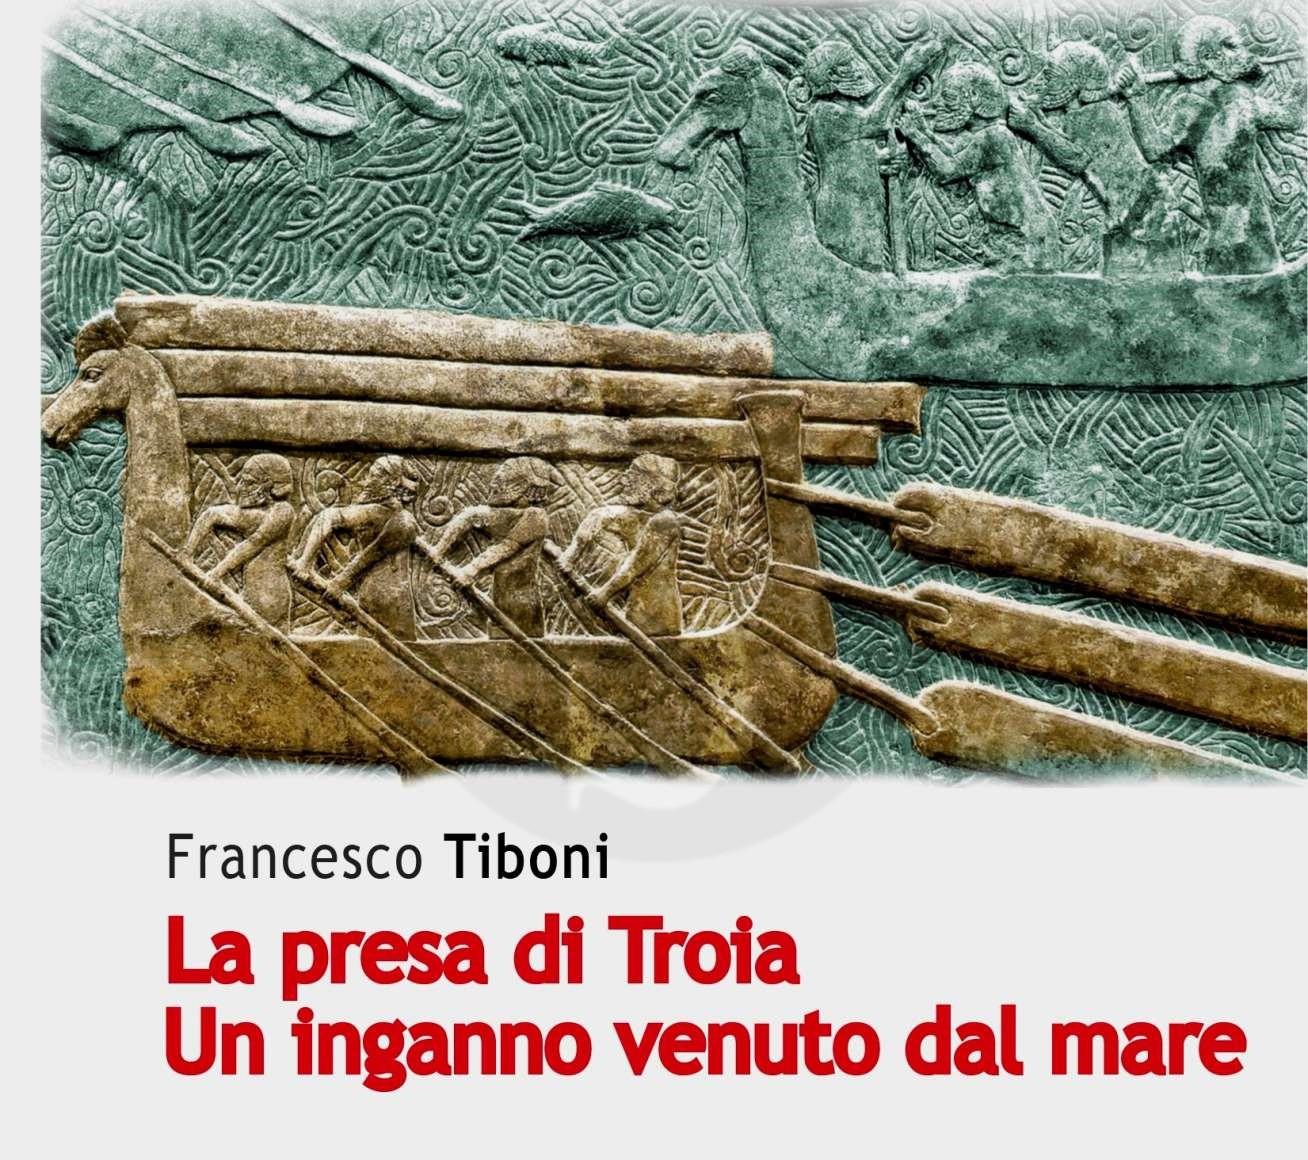 #Libri. L'archeologia navale aiuta a far luce sulla presa di Troia